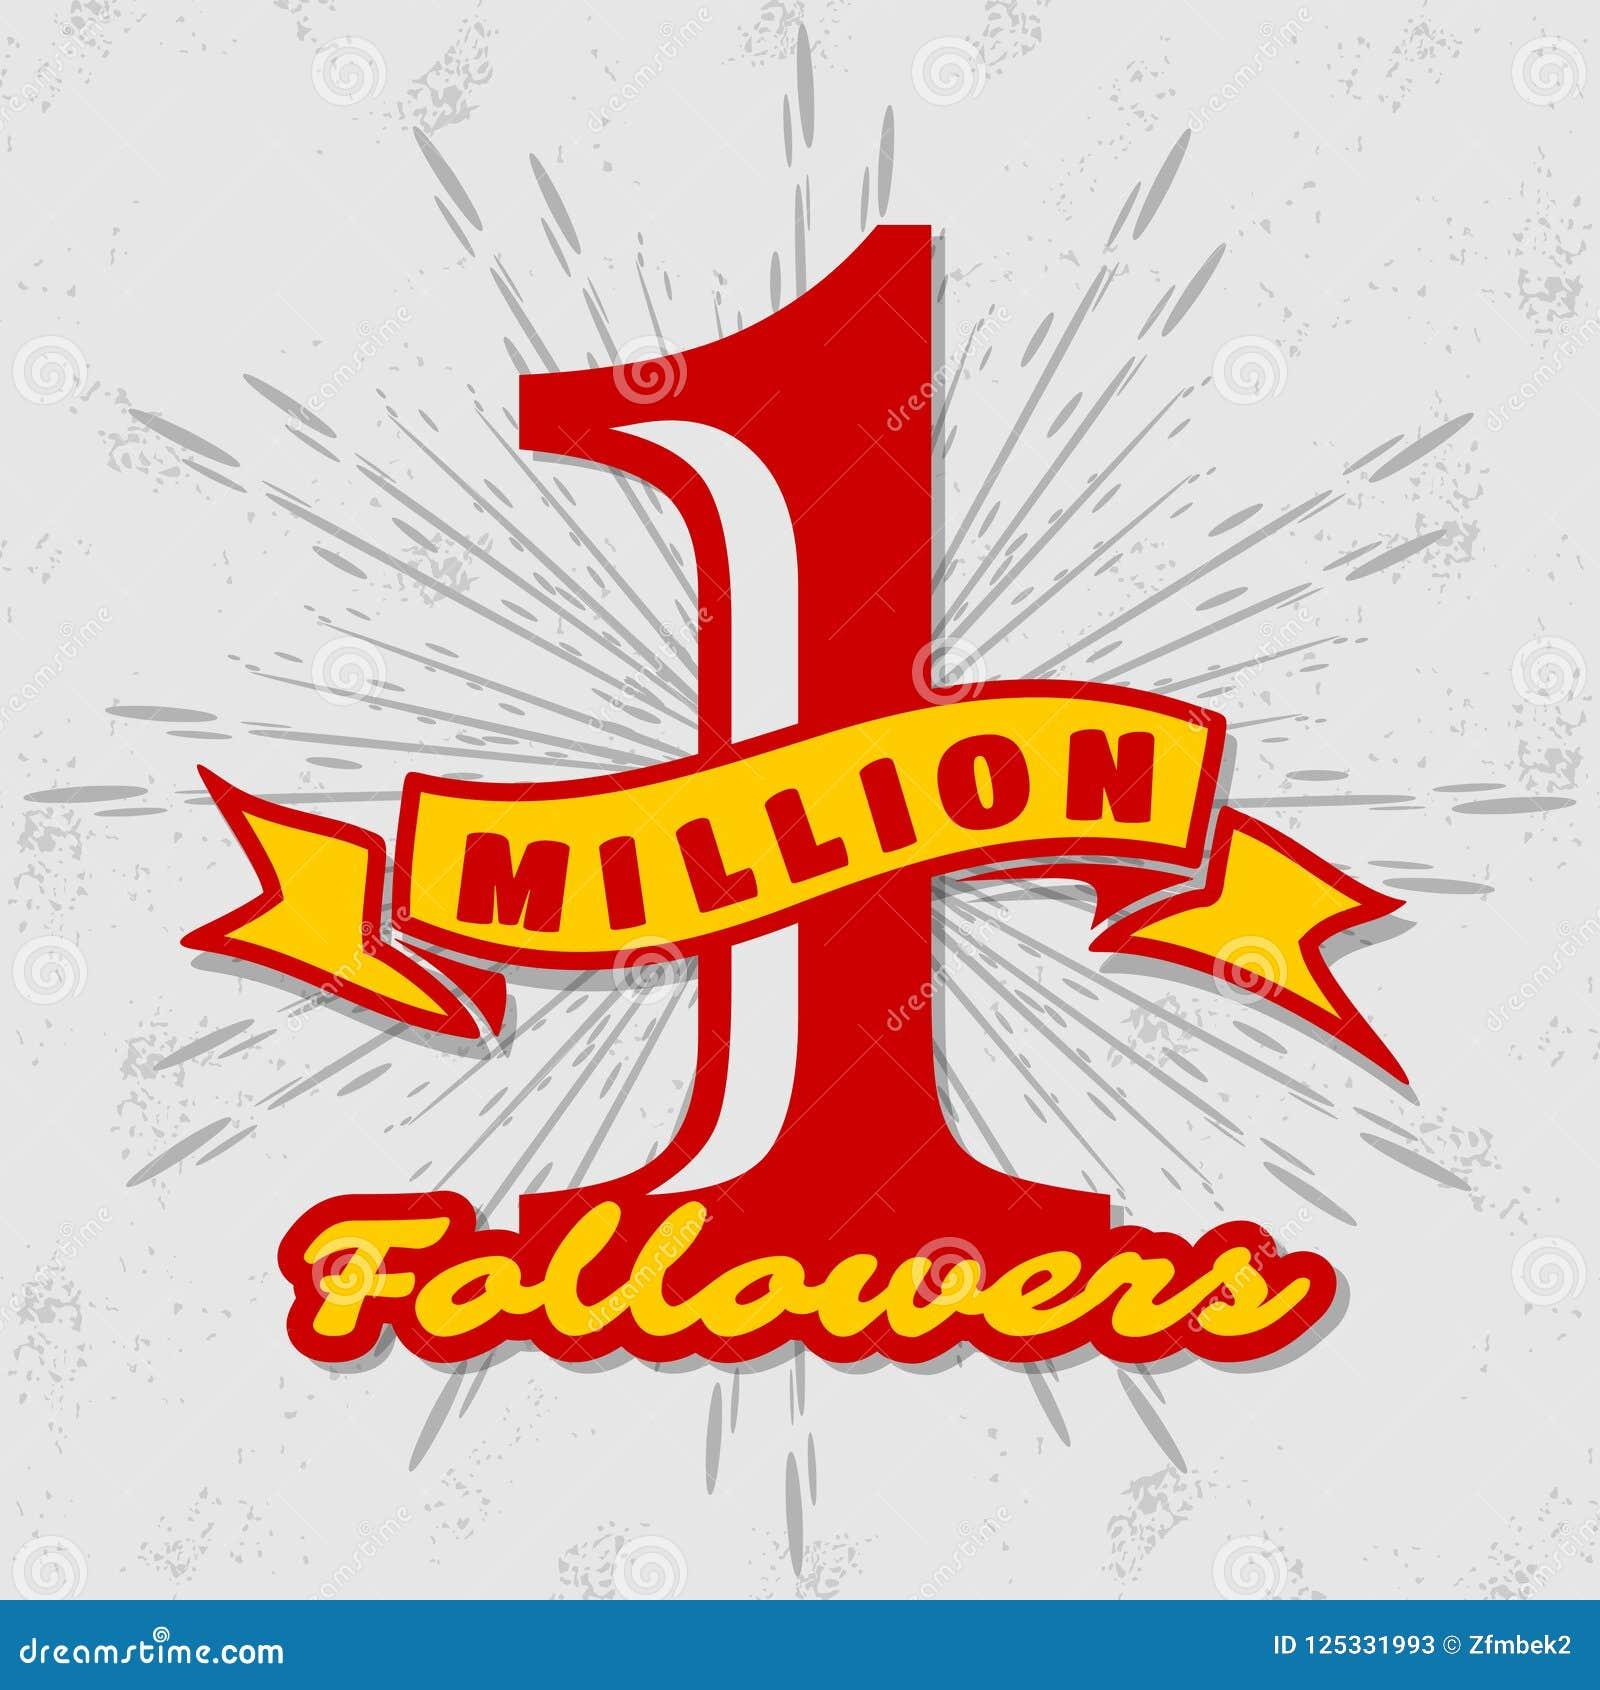 1 Million followers achivement symbol.